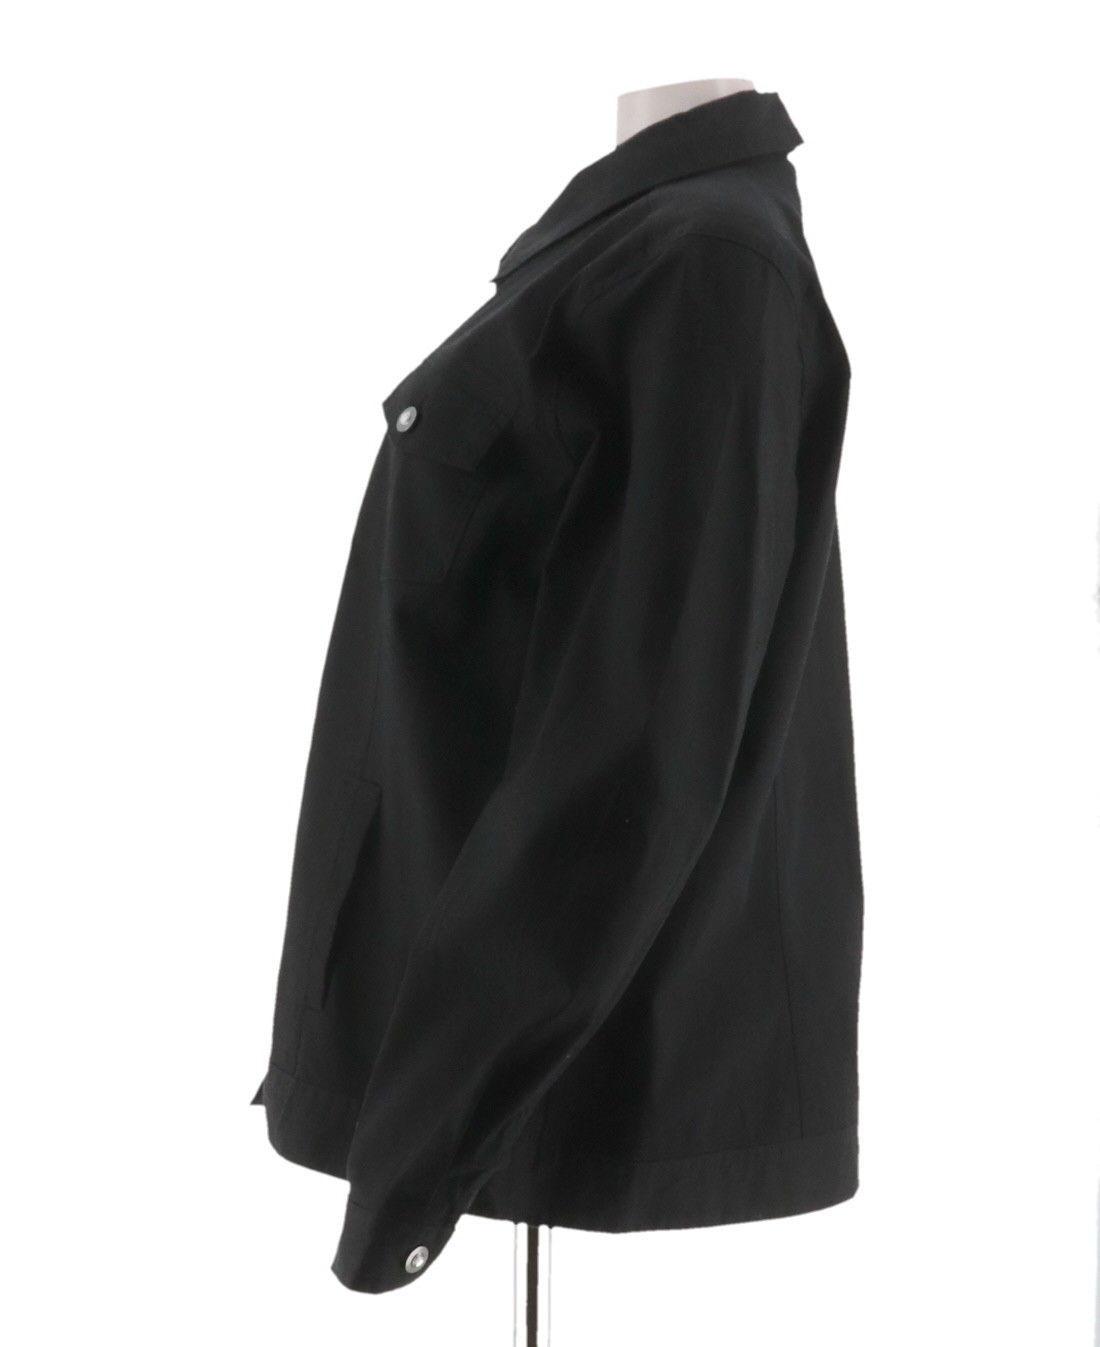 Denim & Co Elegant Stretch Twill Jean Jacket Bling Button Black XS NEW A199936